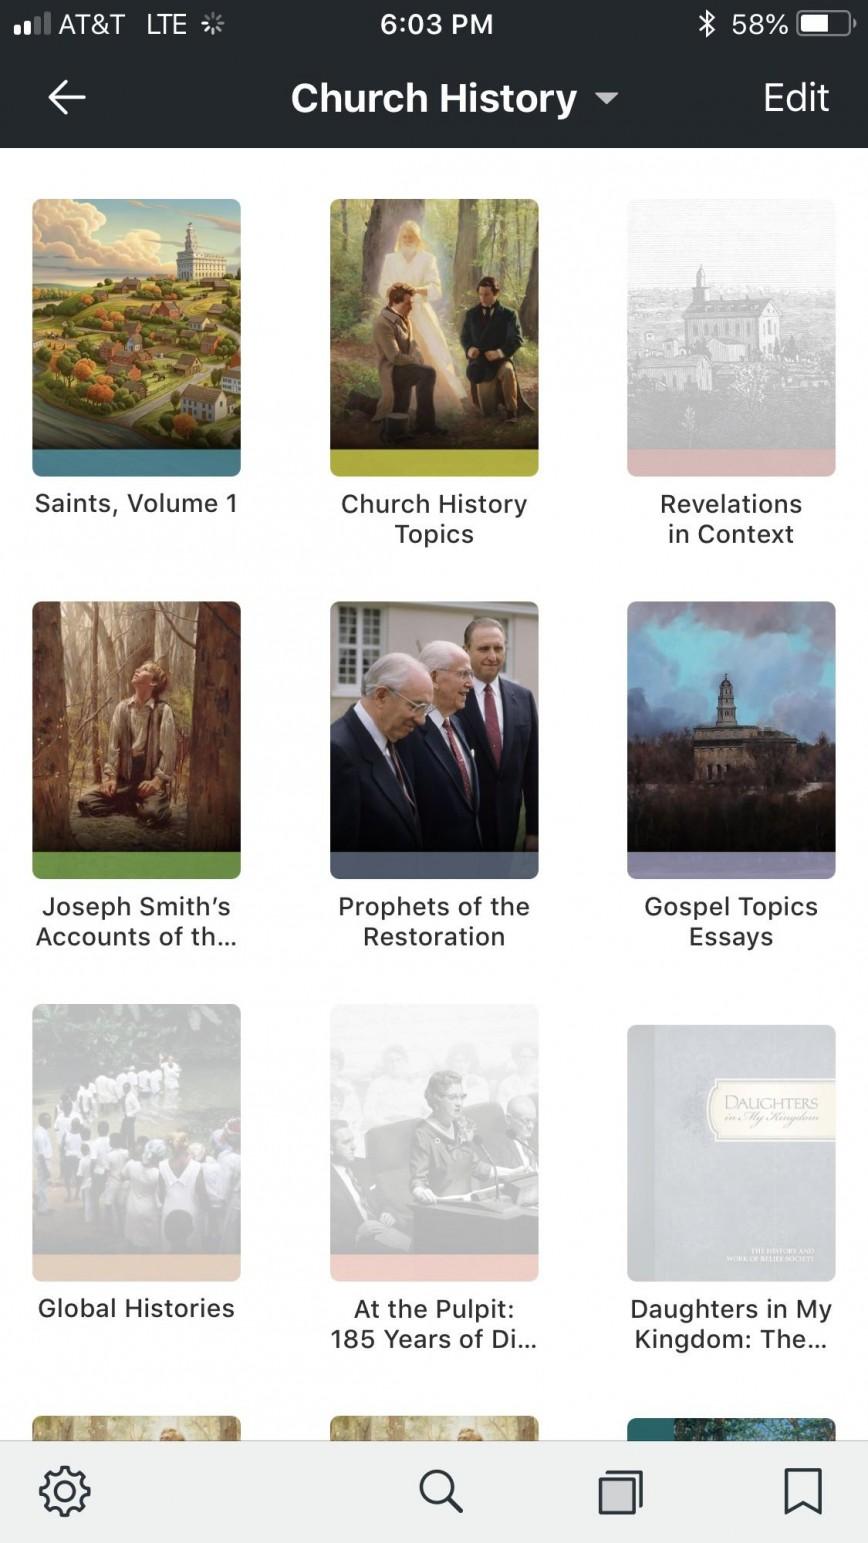 004 Y3rimfgj5jh11 Gospel Topics Essays Essay Outstanding Becoming Like God Book Of Abraham